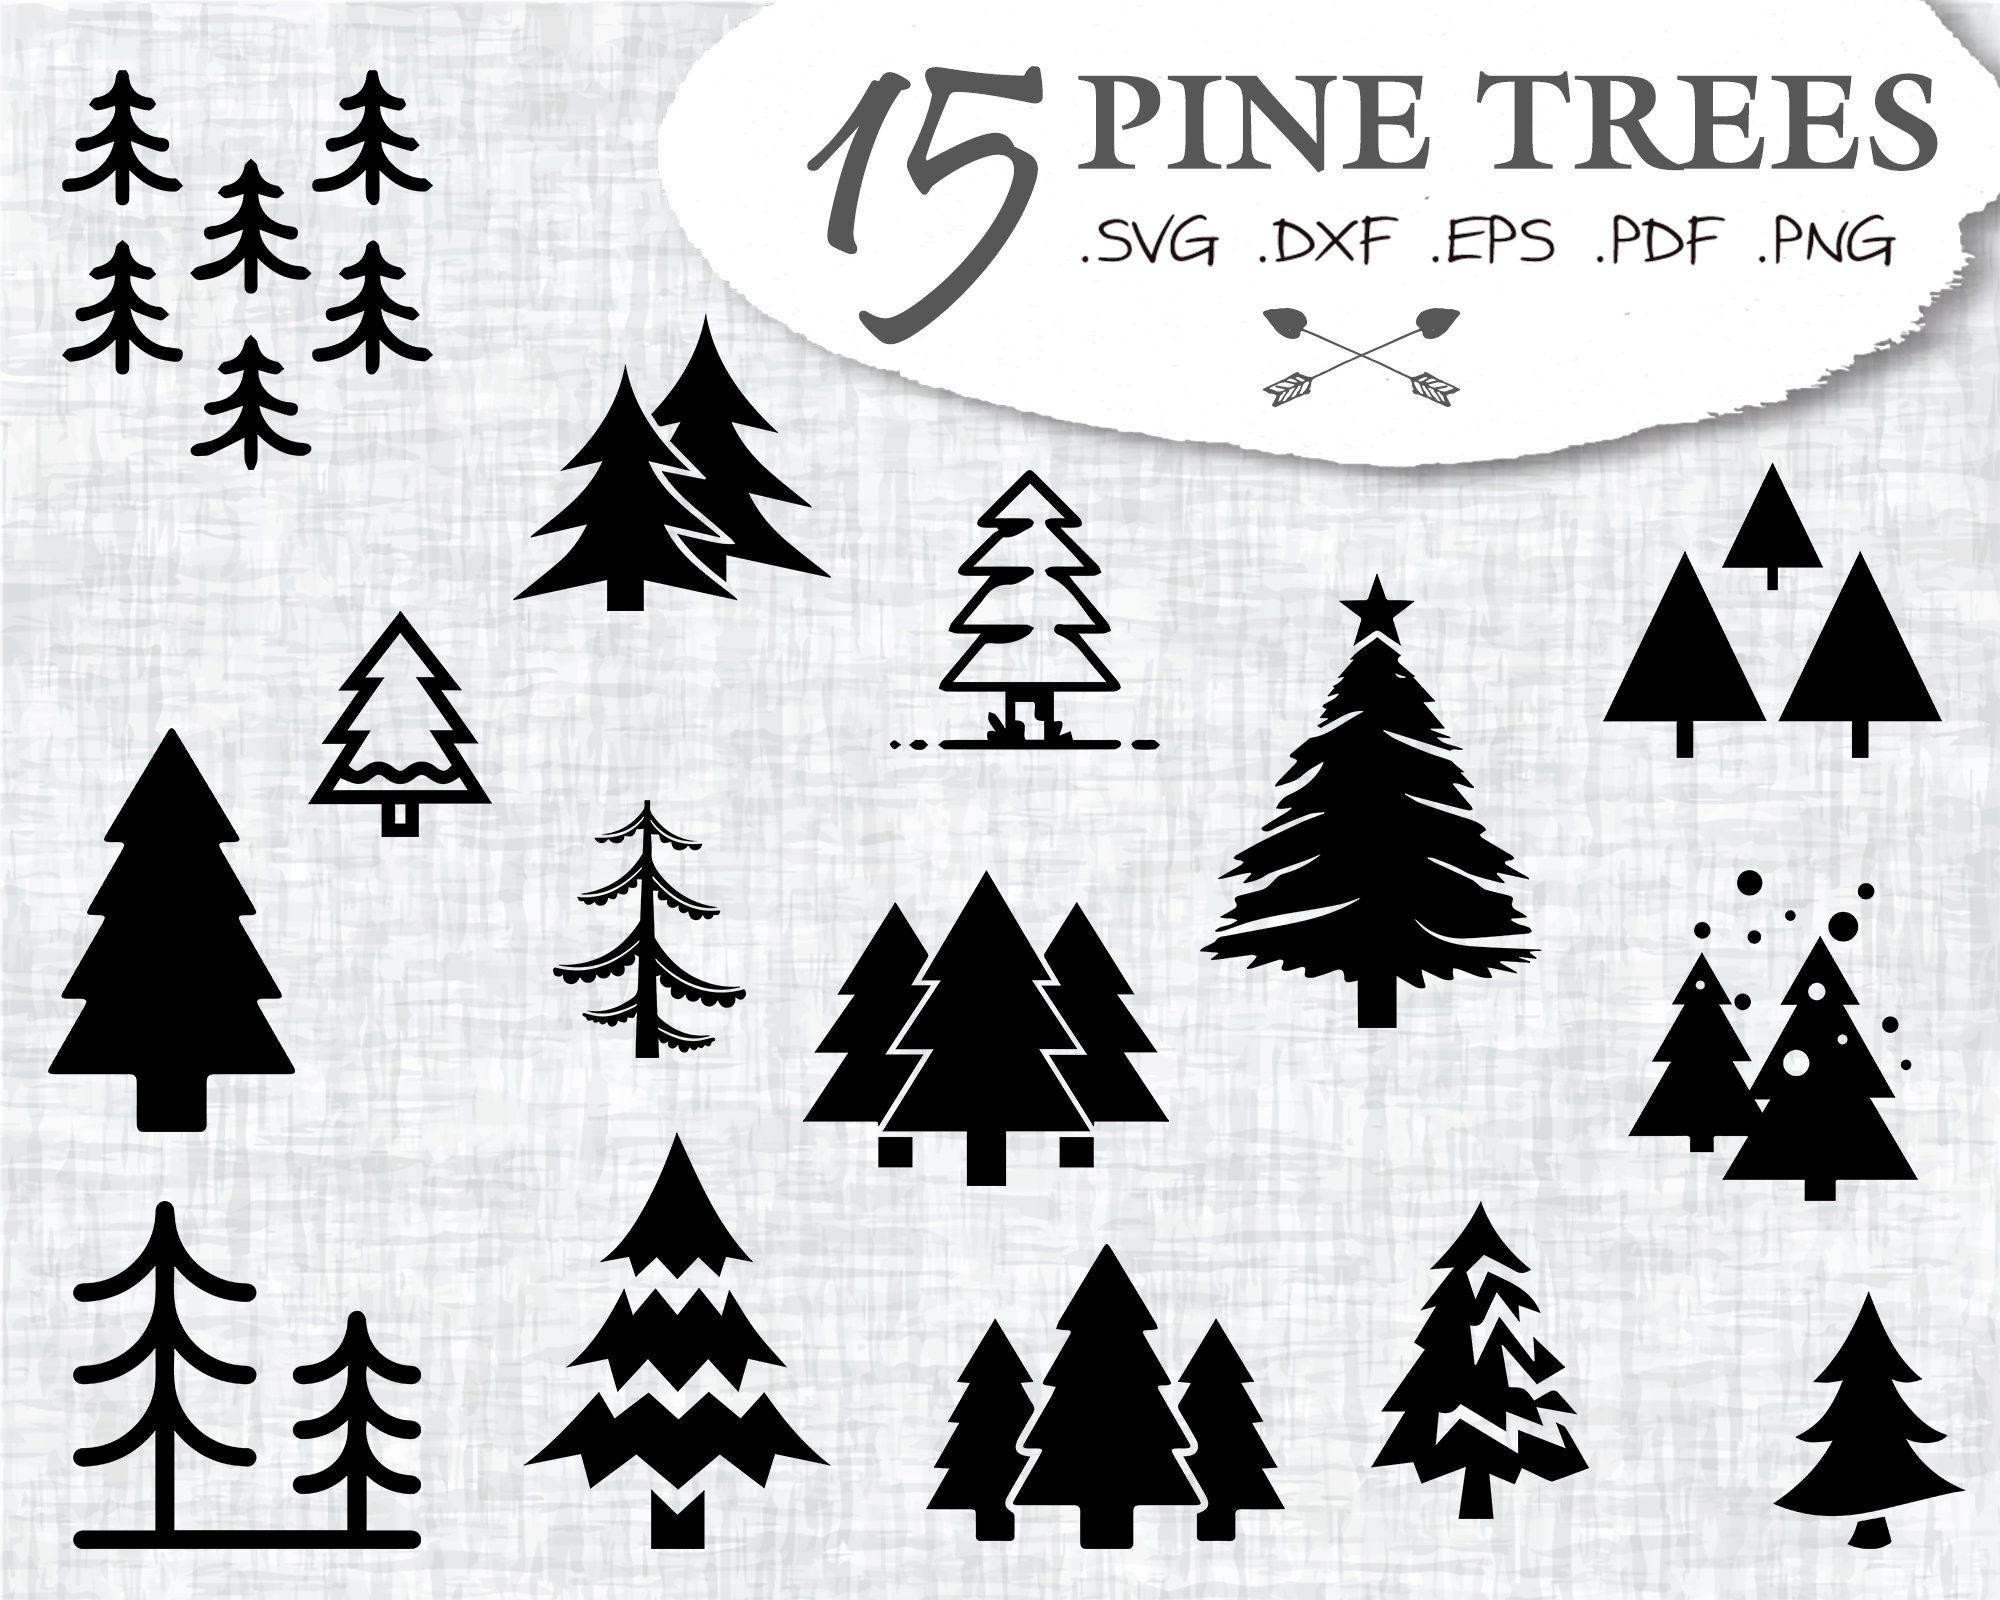 PINE TREES SVG, pine tree svg, forest svg, christmas tree